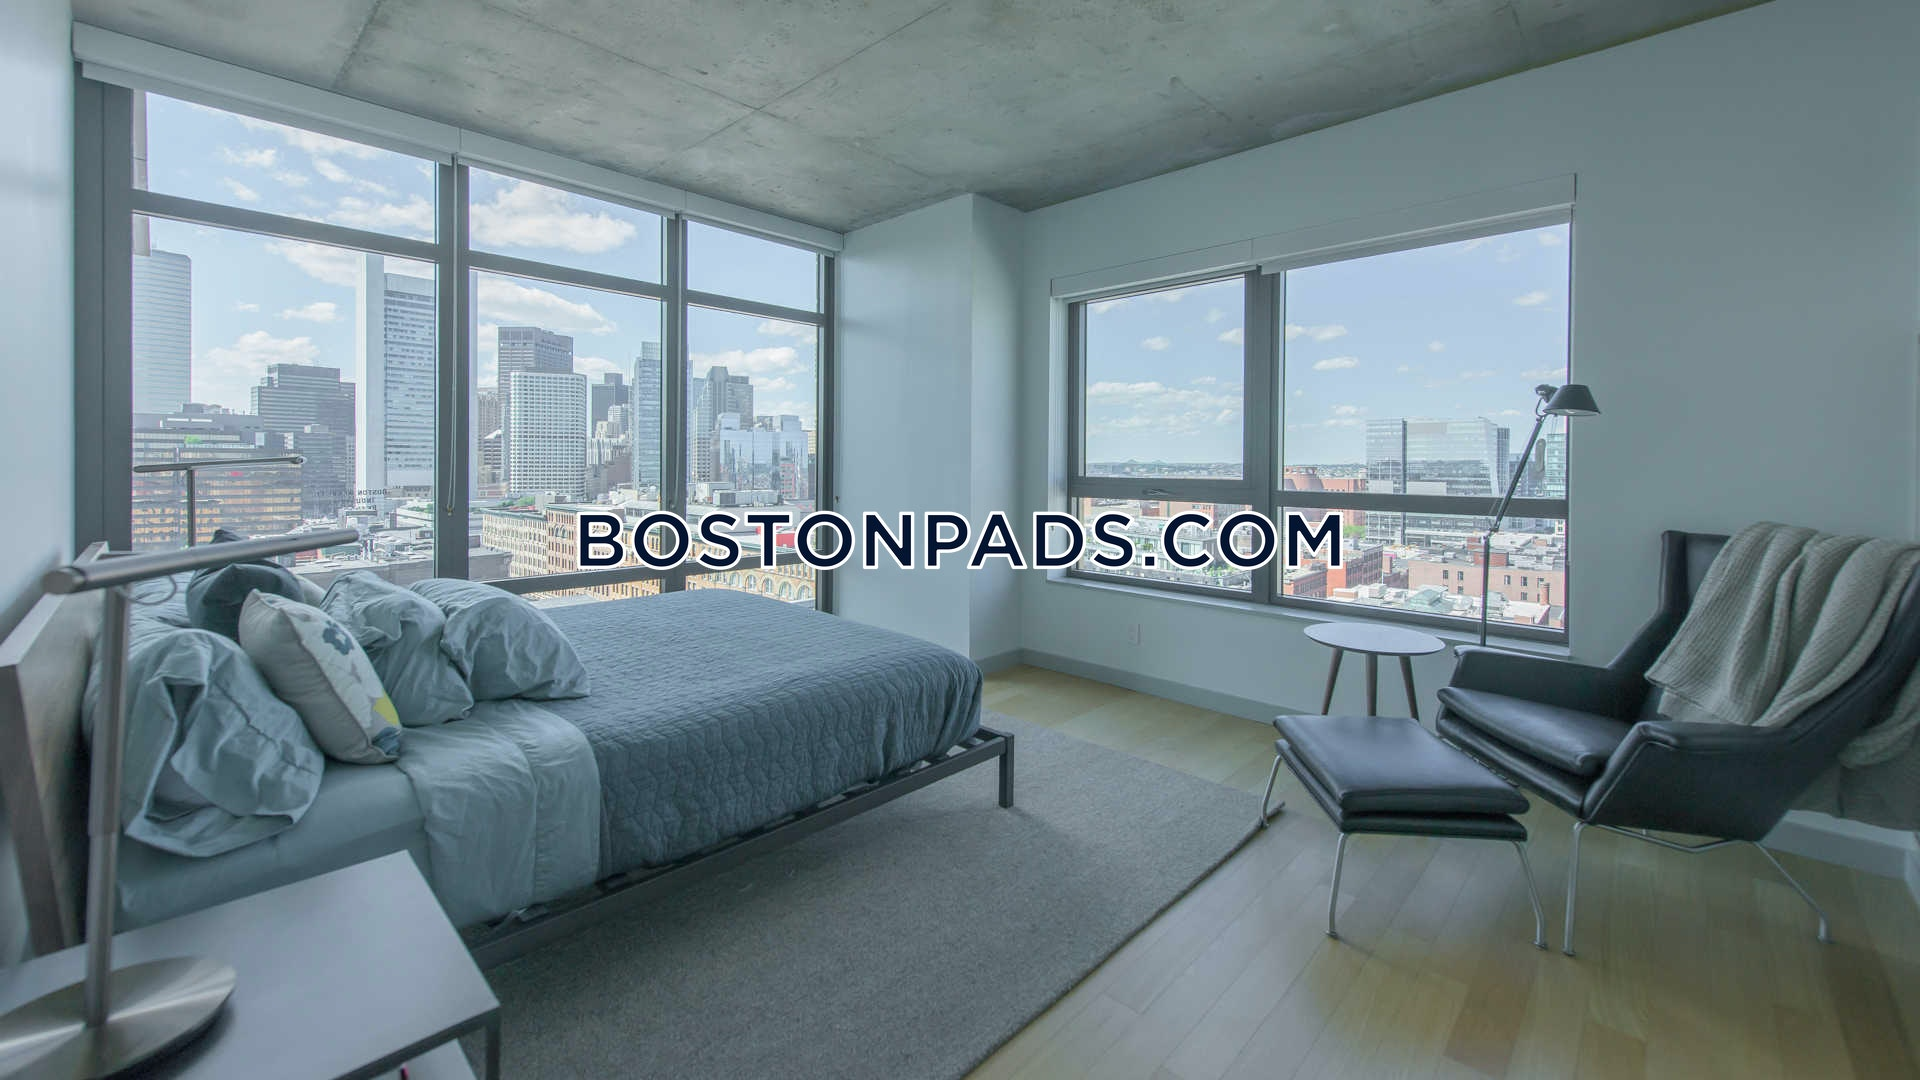 Fenway Apartments | TRULY AMAZING 1 BED 1 BATH UNIT-LUXURY BUILDING ...